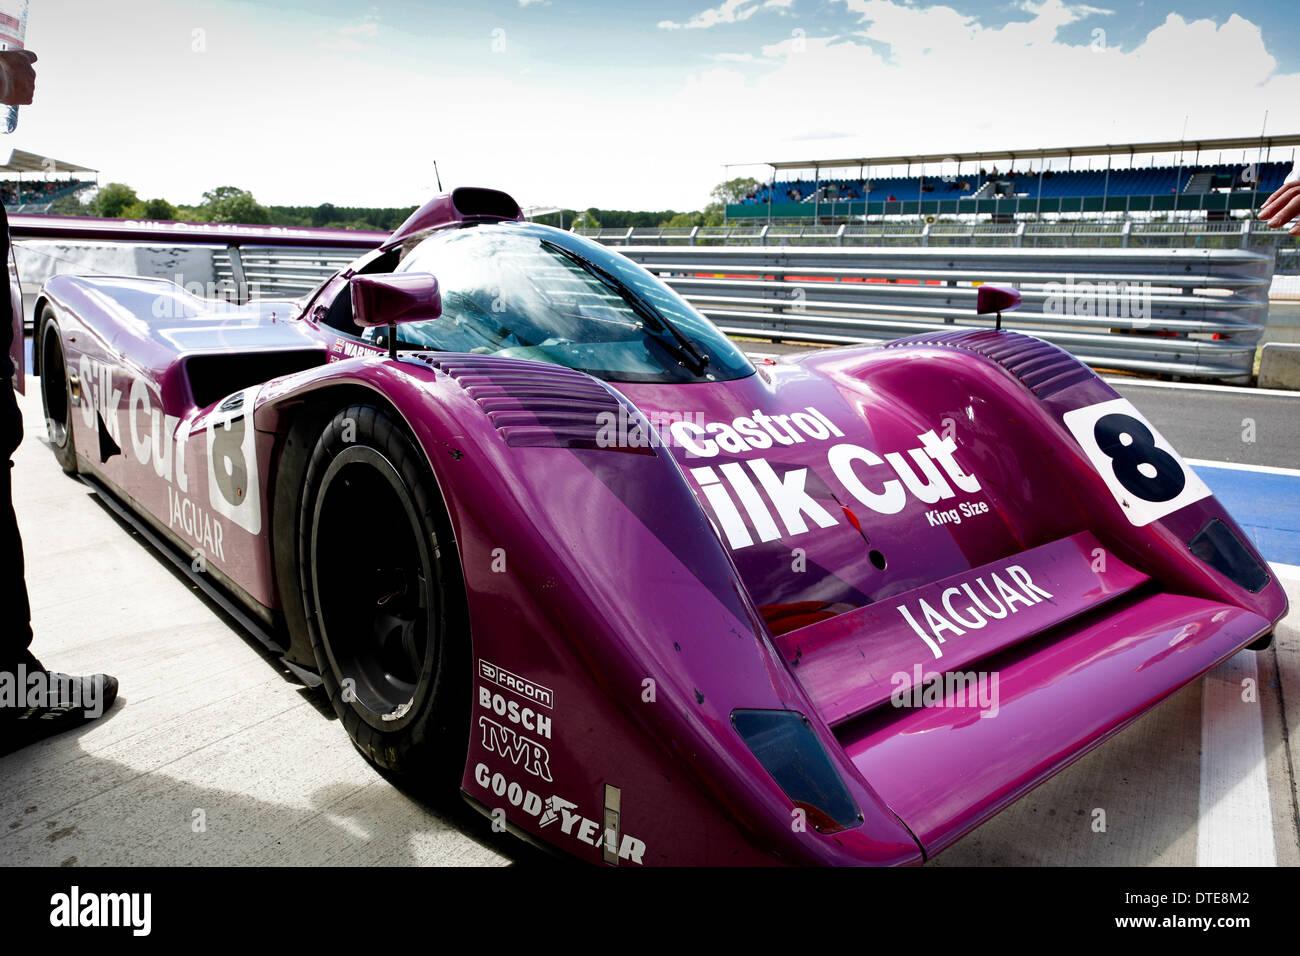 a purple jaguar le mans race car in silk cut livery stock. Black Bedroom Furniture Sets. Home Design Ideas